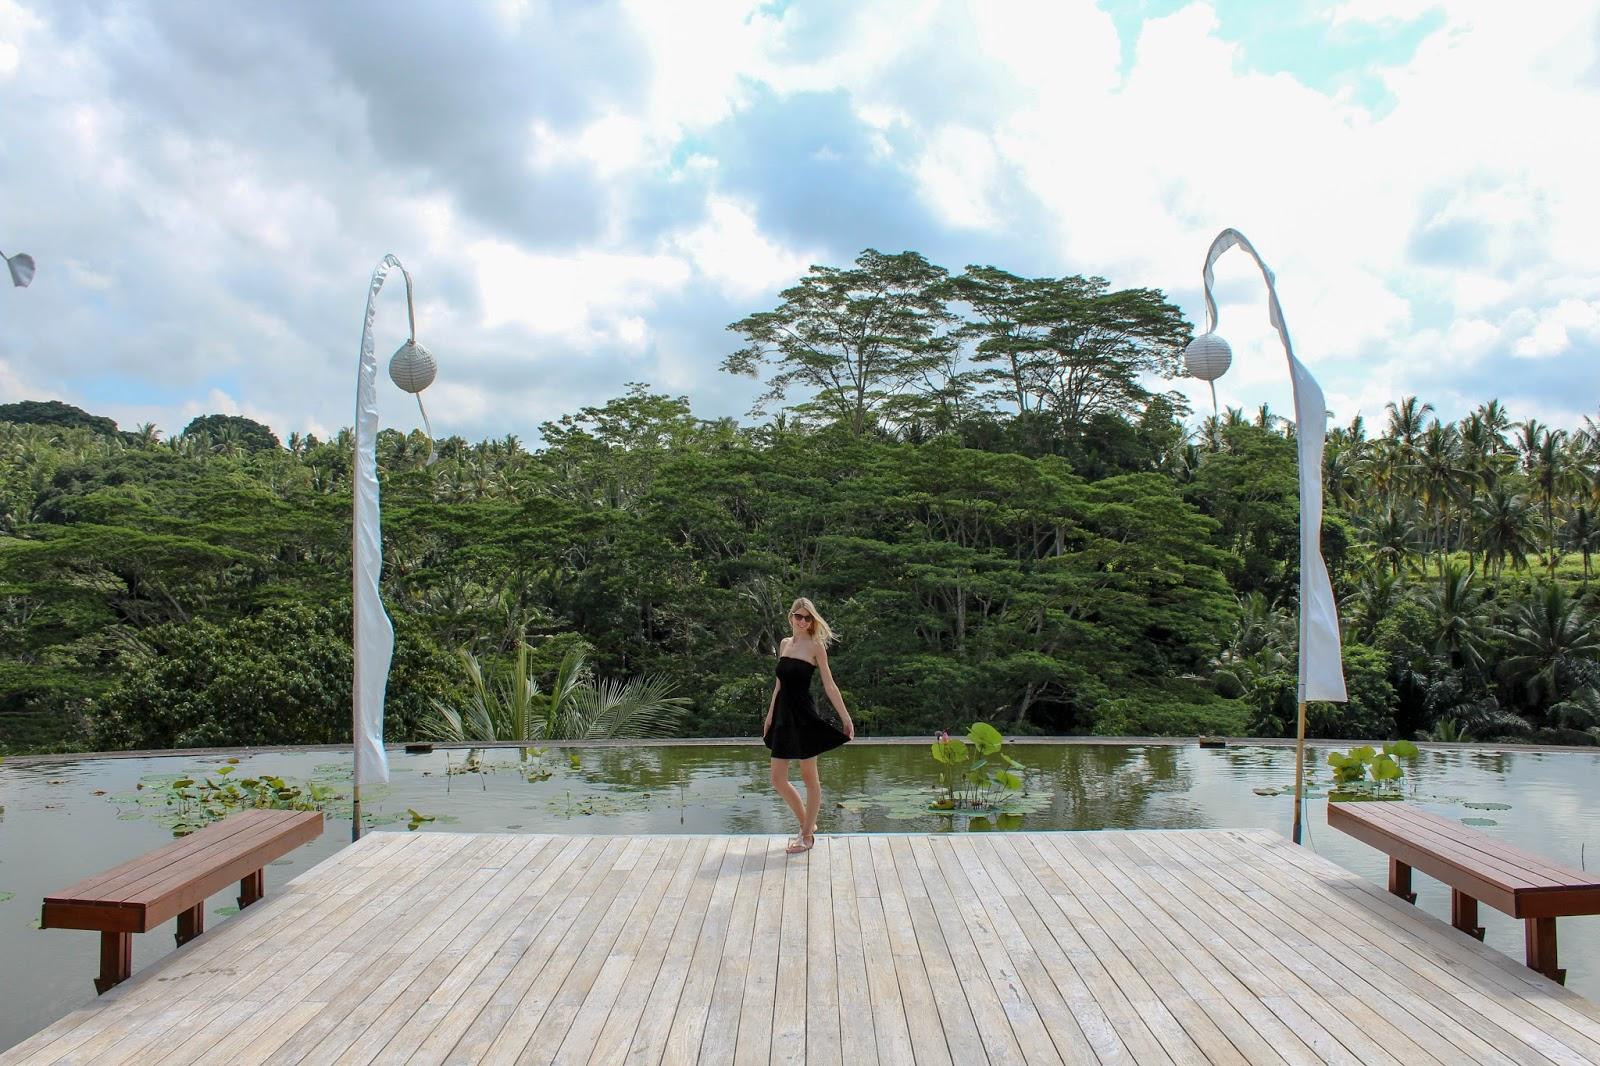 Four Seasons at Sayan: A Luxury Retreat in Bali